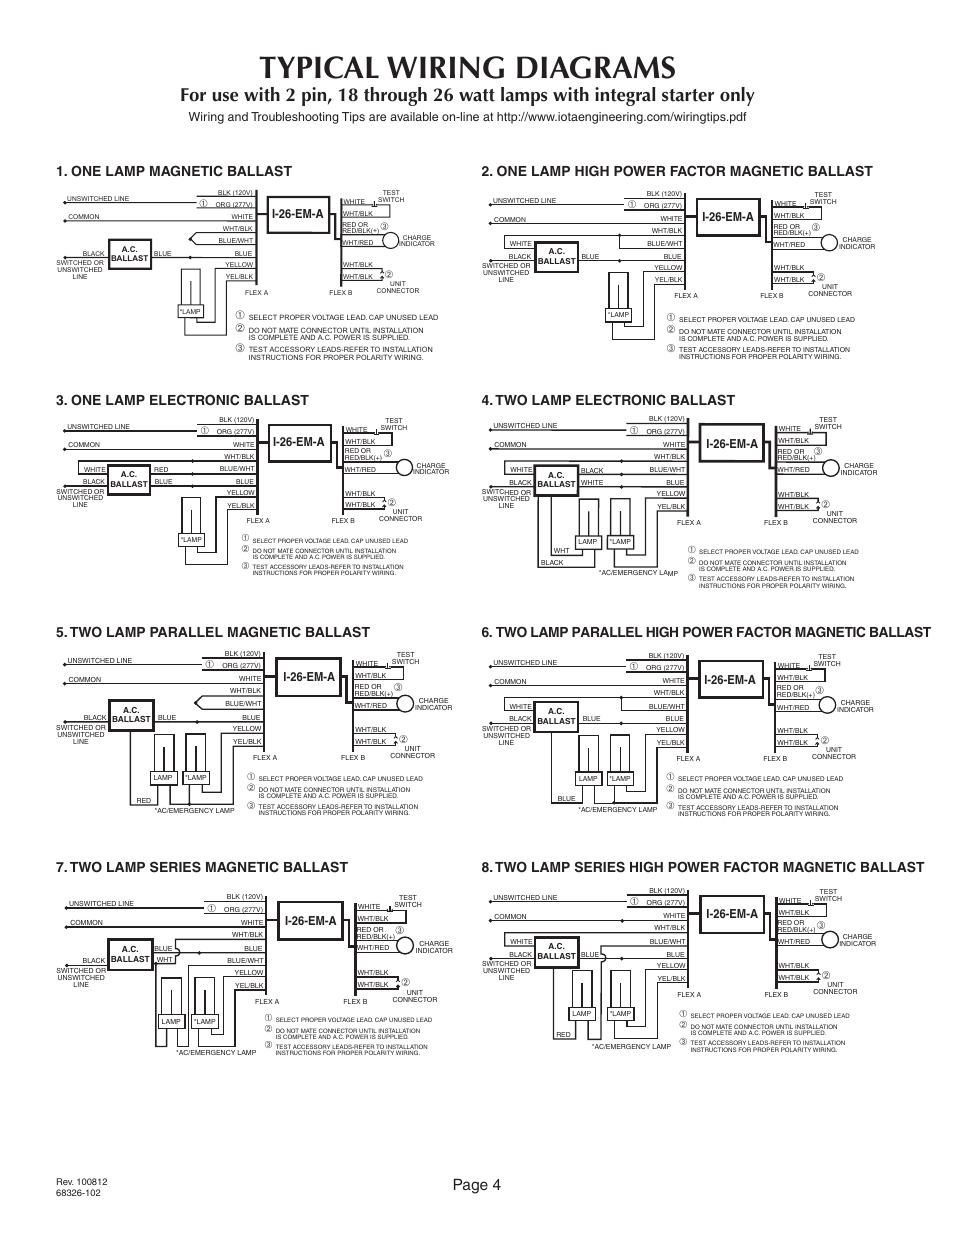 iota i 24 emergency ballast wiring diagram 2000 vw jetta audio fluorescent best librarytypical diagrams page 4 26 em a